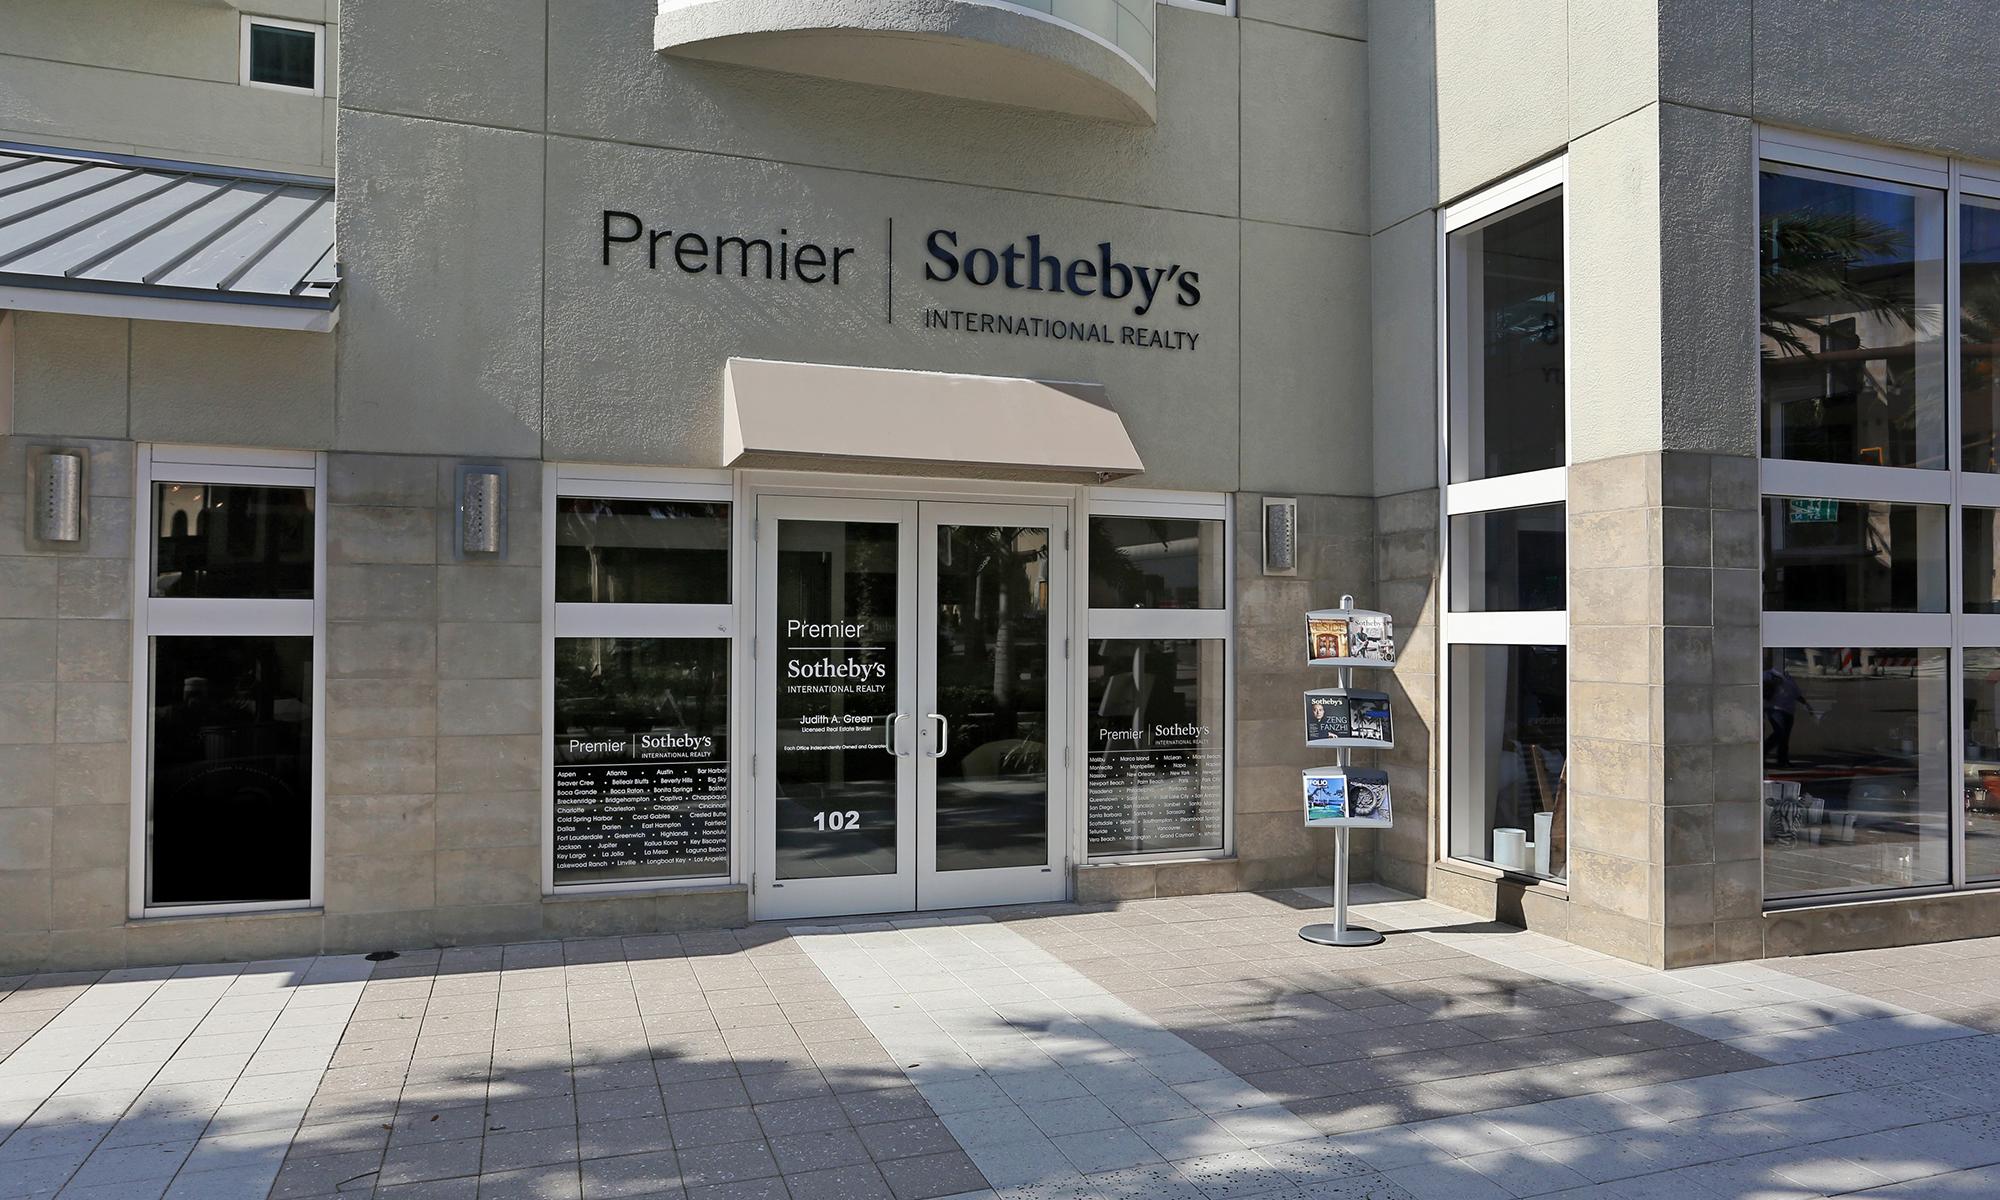 Premier Sotheby's International Realty St. Petersburg